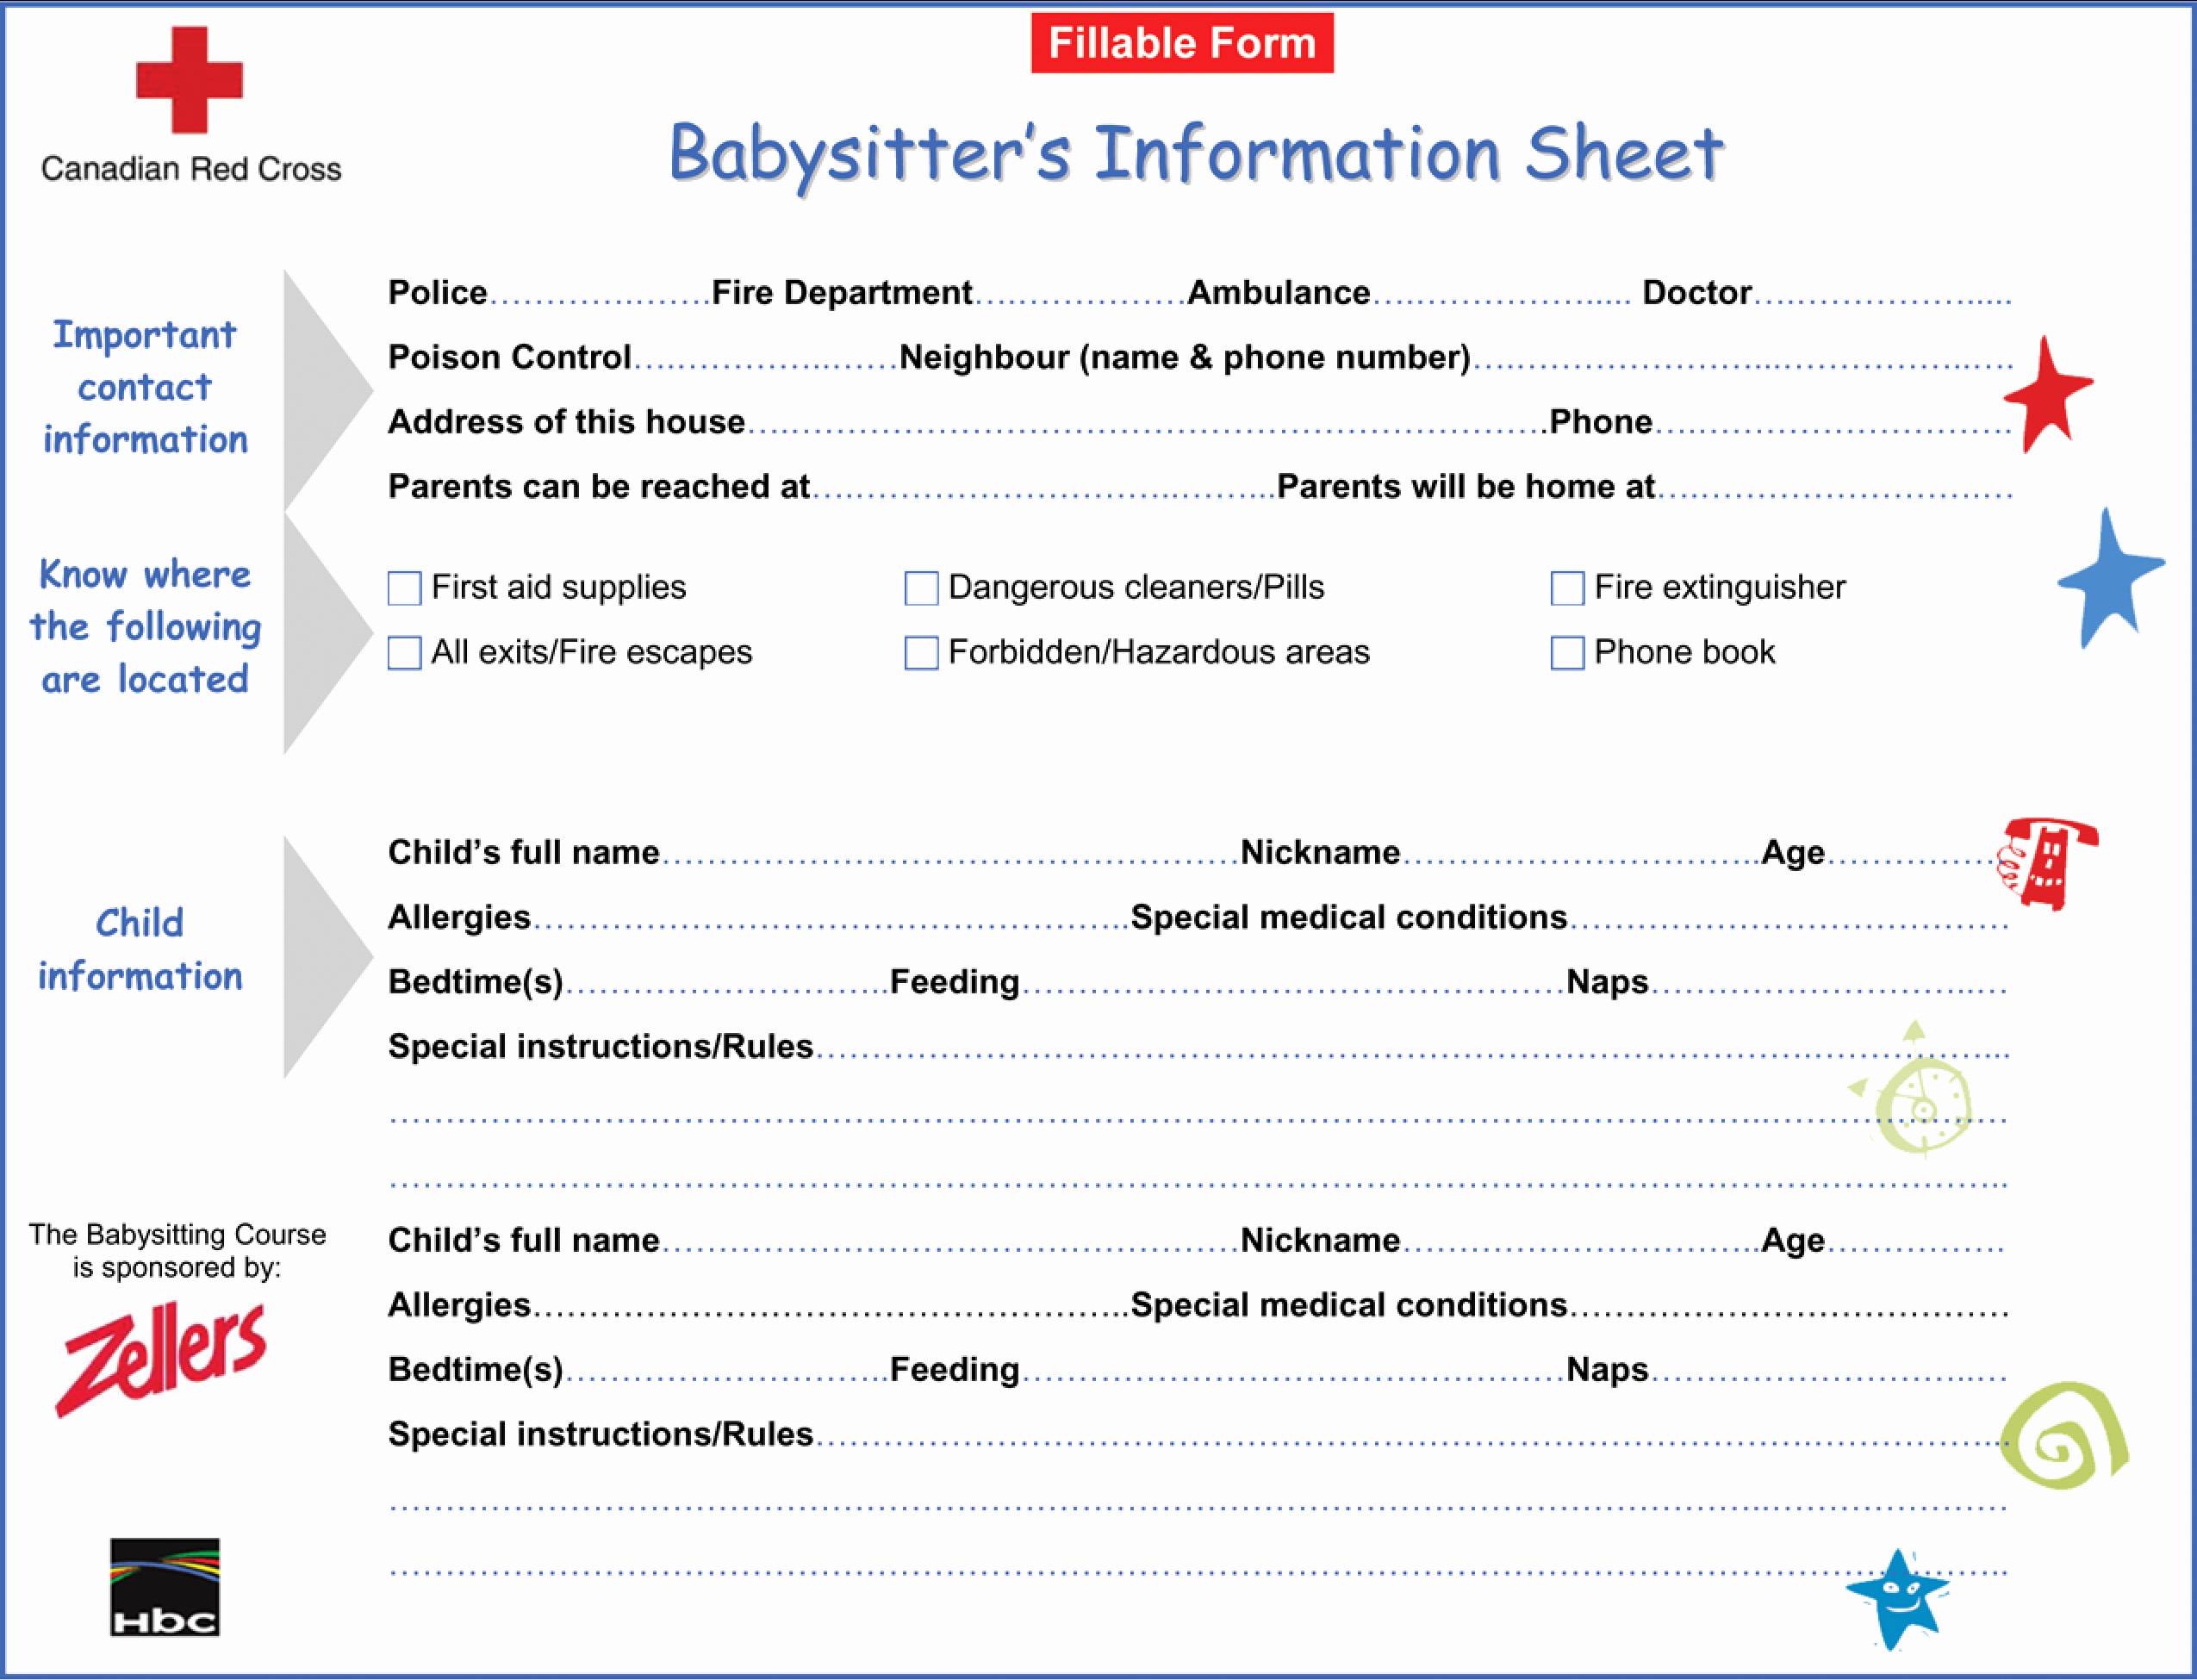 Babysitter Information Sheet Template New Printable Babysitter Information Sheet